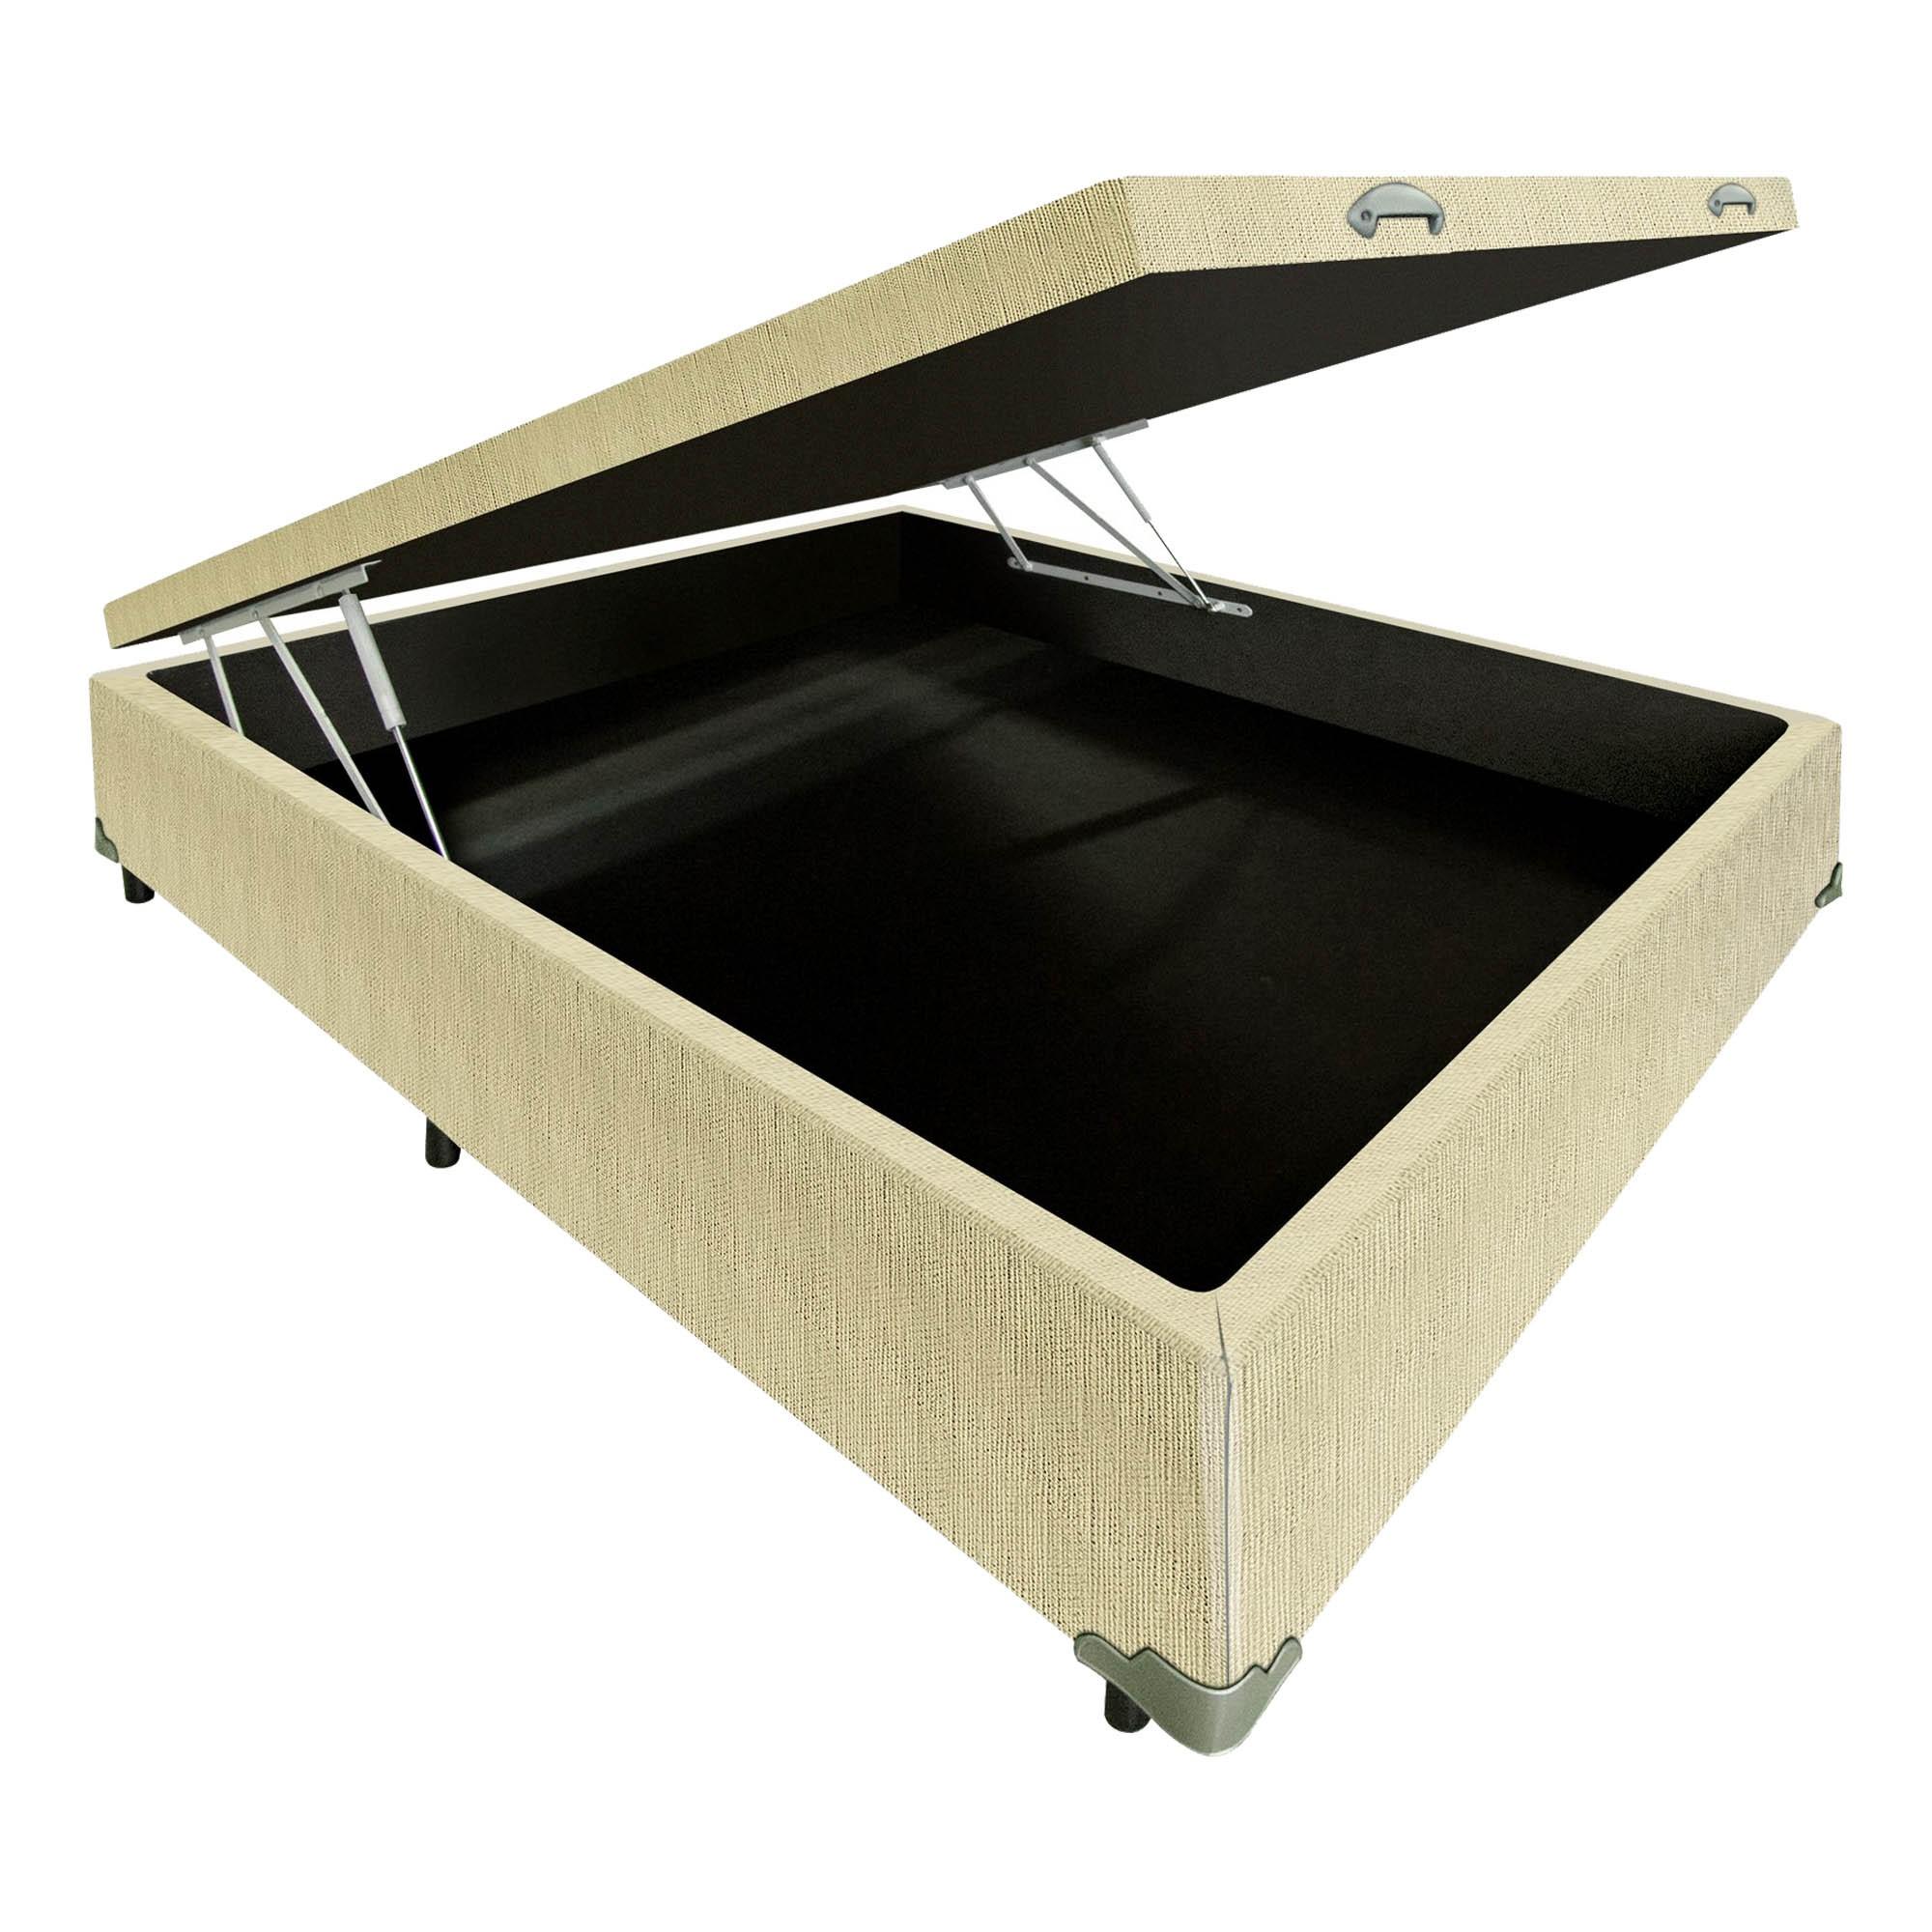 Box Baú Linhão Palha [Viúva 120 x 203 cm]